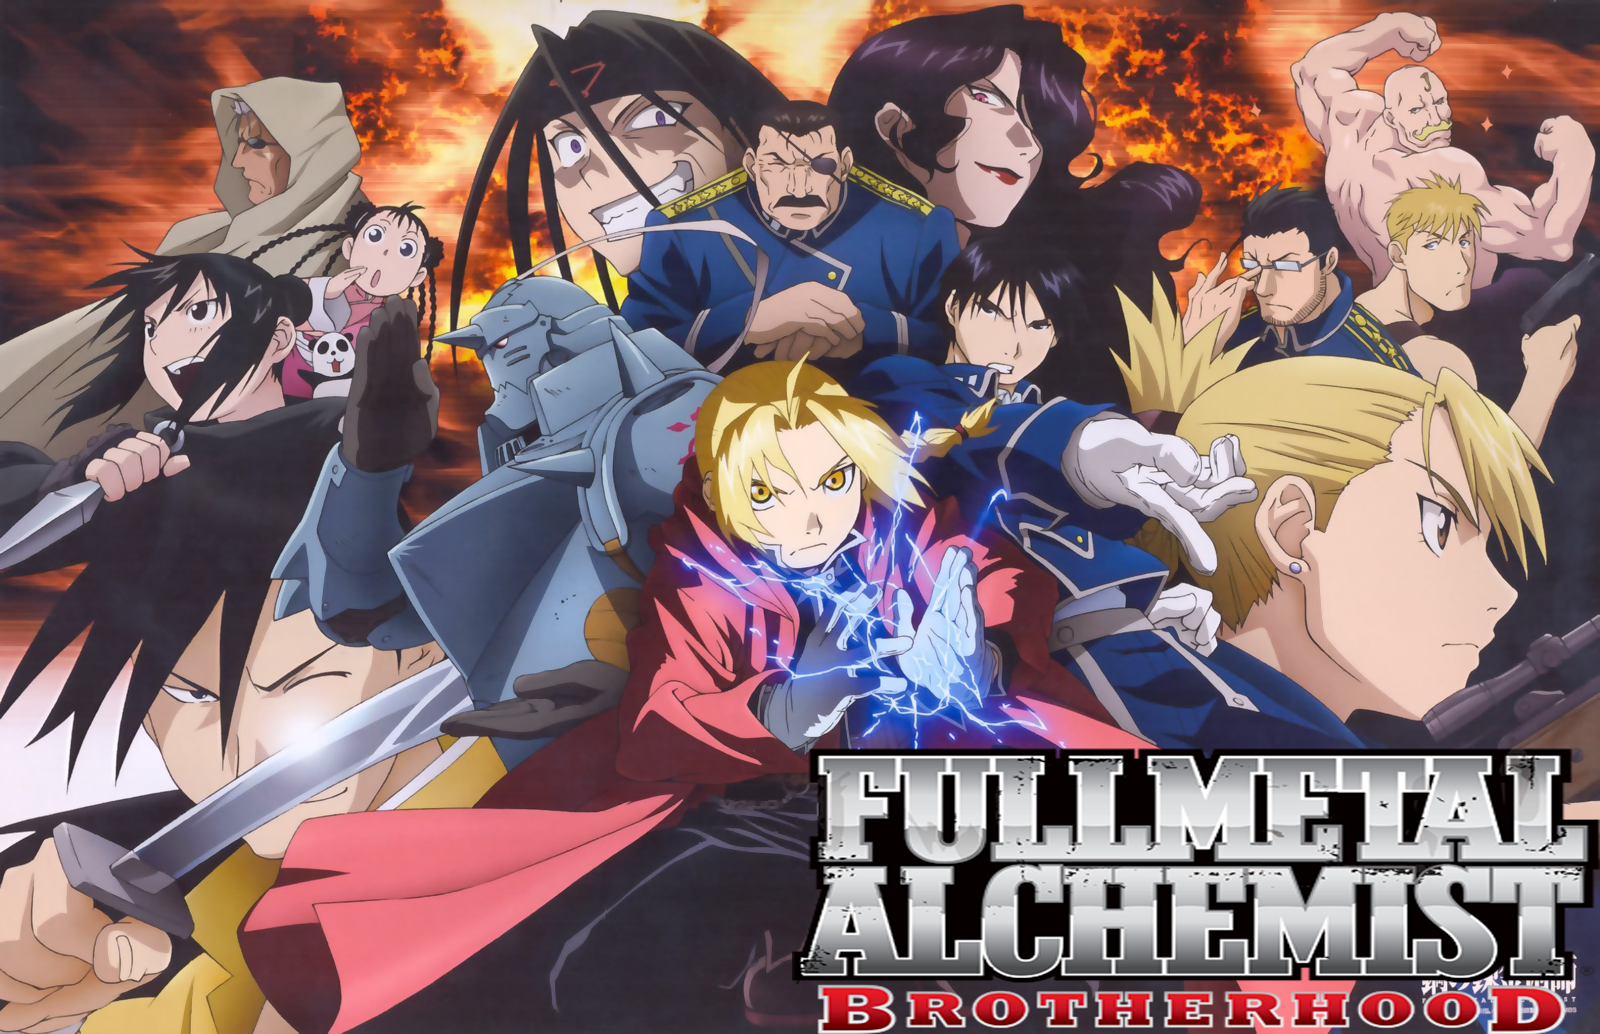 Fullmetal Alchemist Brotherhood 11 Background Wallpaper 1600x1034